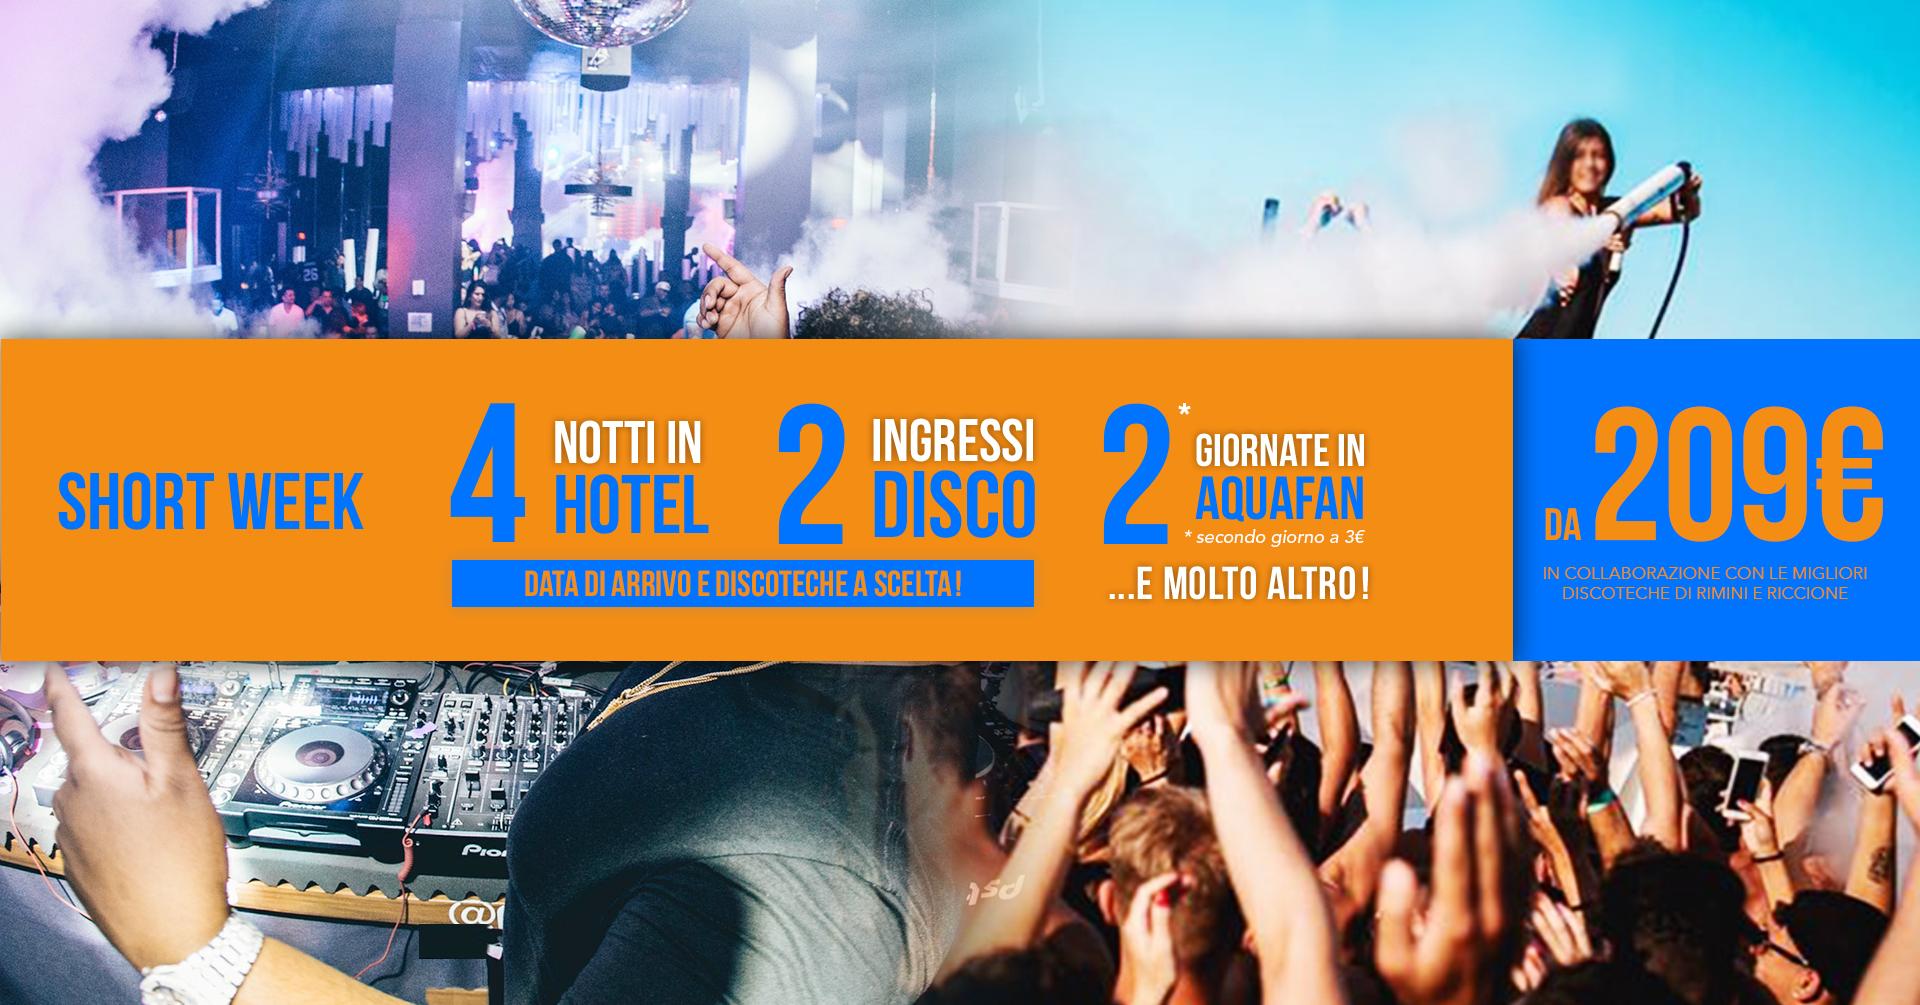 Pacchetto riccione hotel + discoteche short week